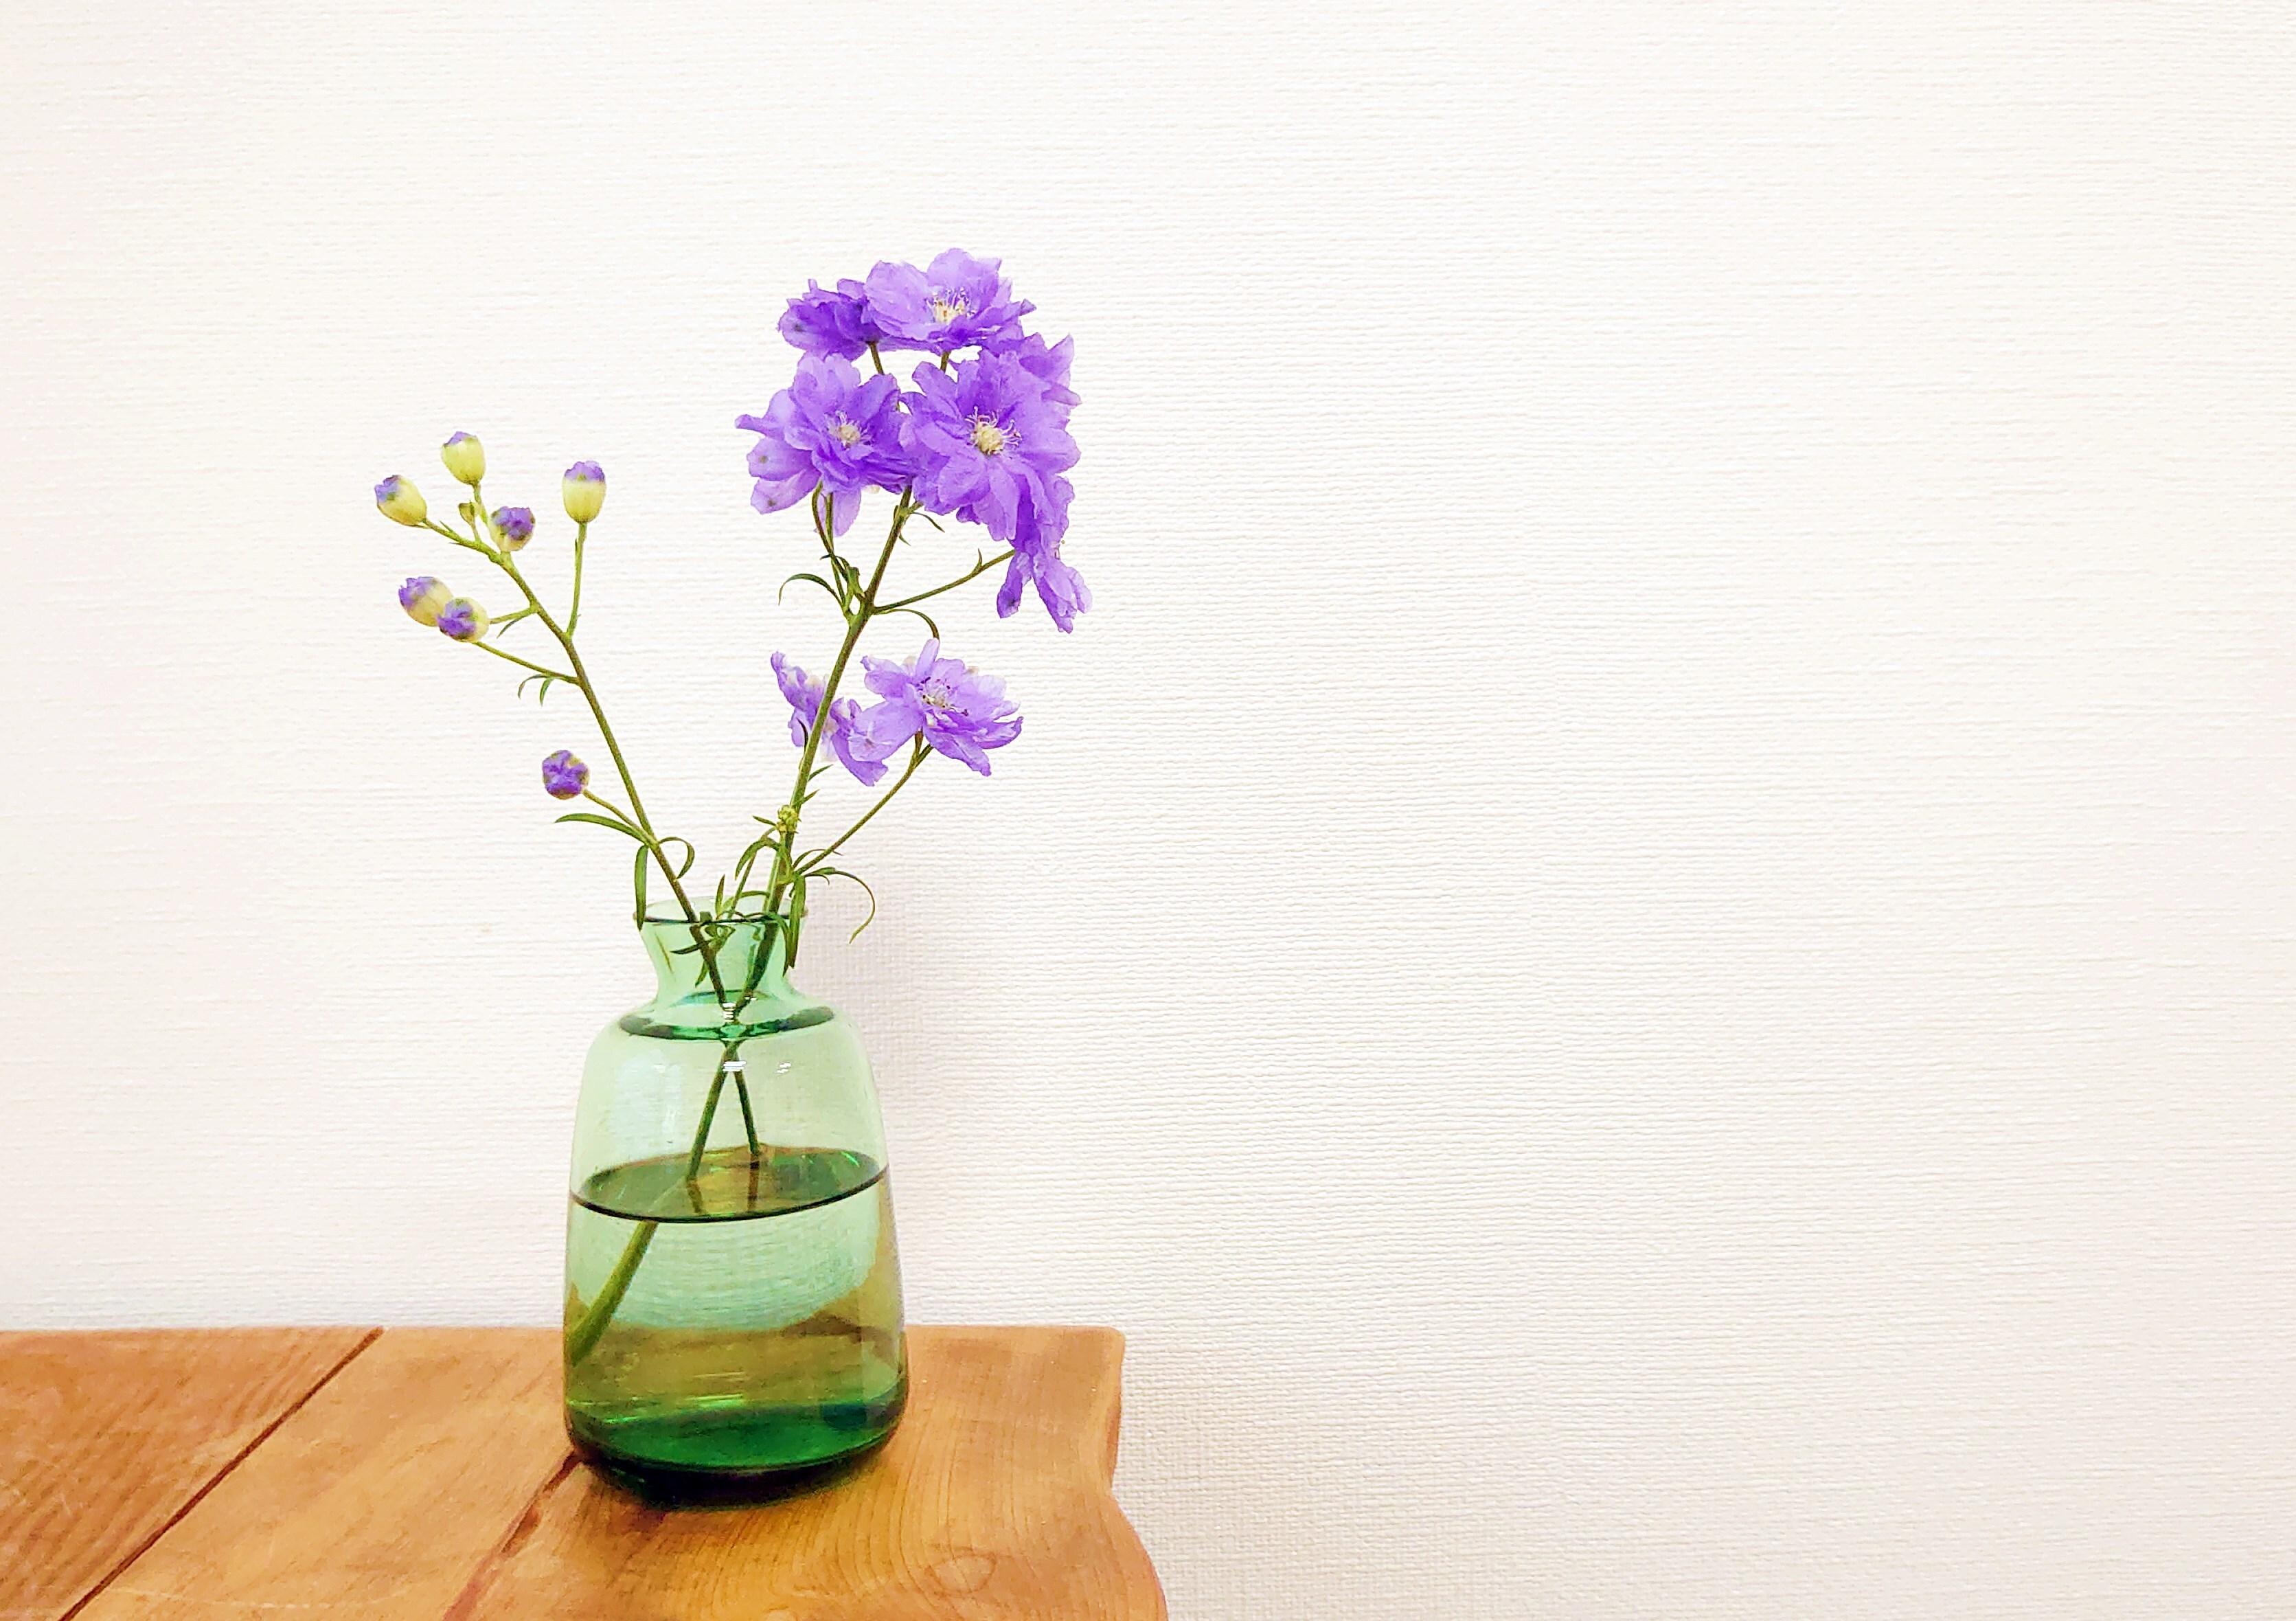 Amelie Glass アメリーグラス C-GR